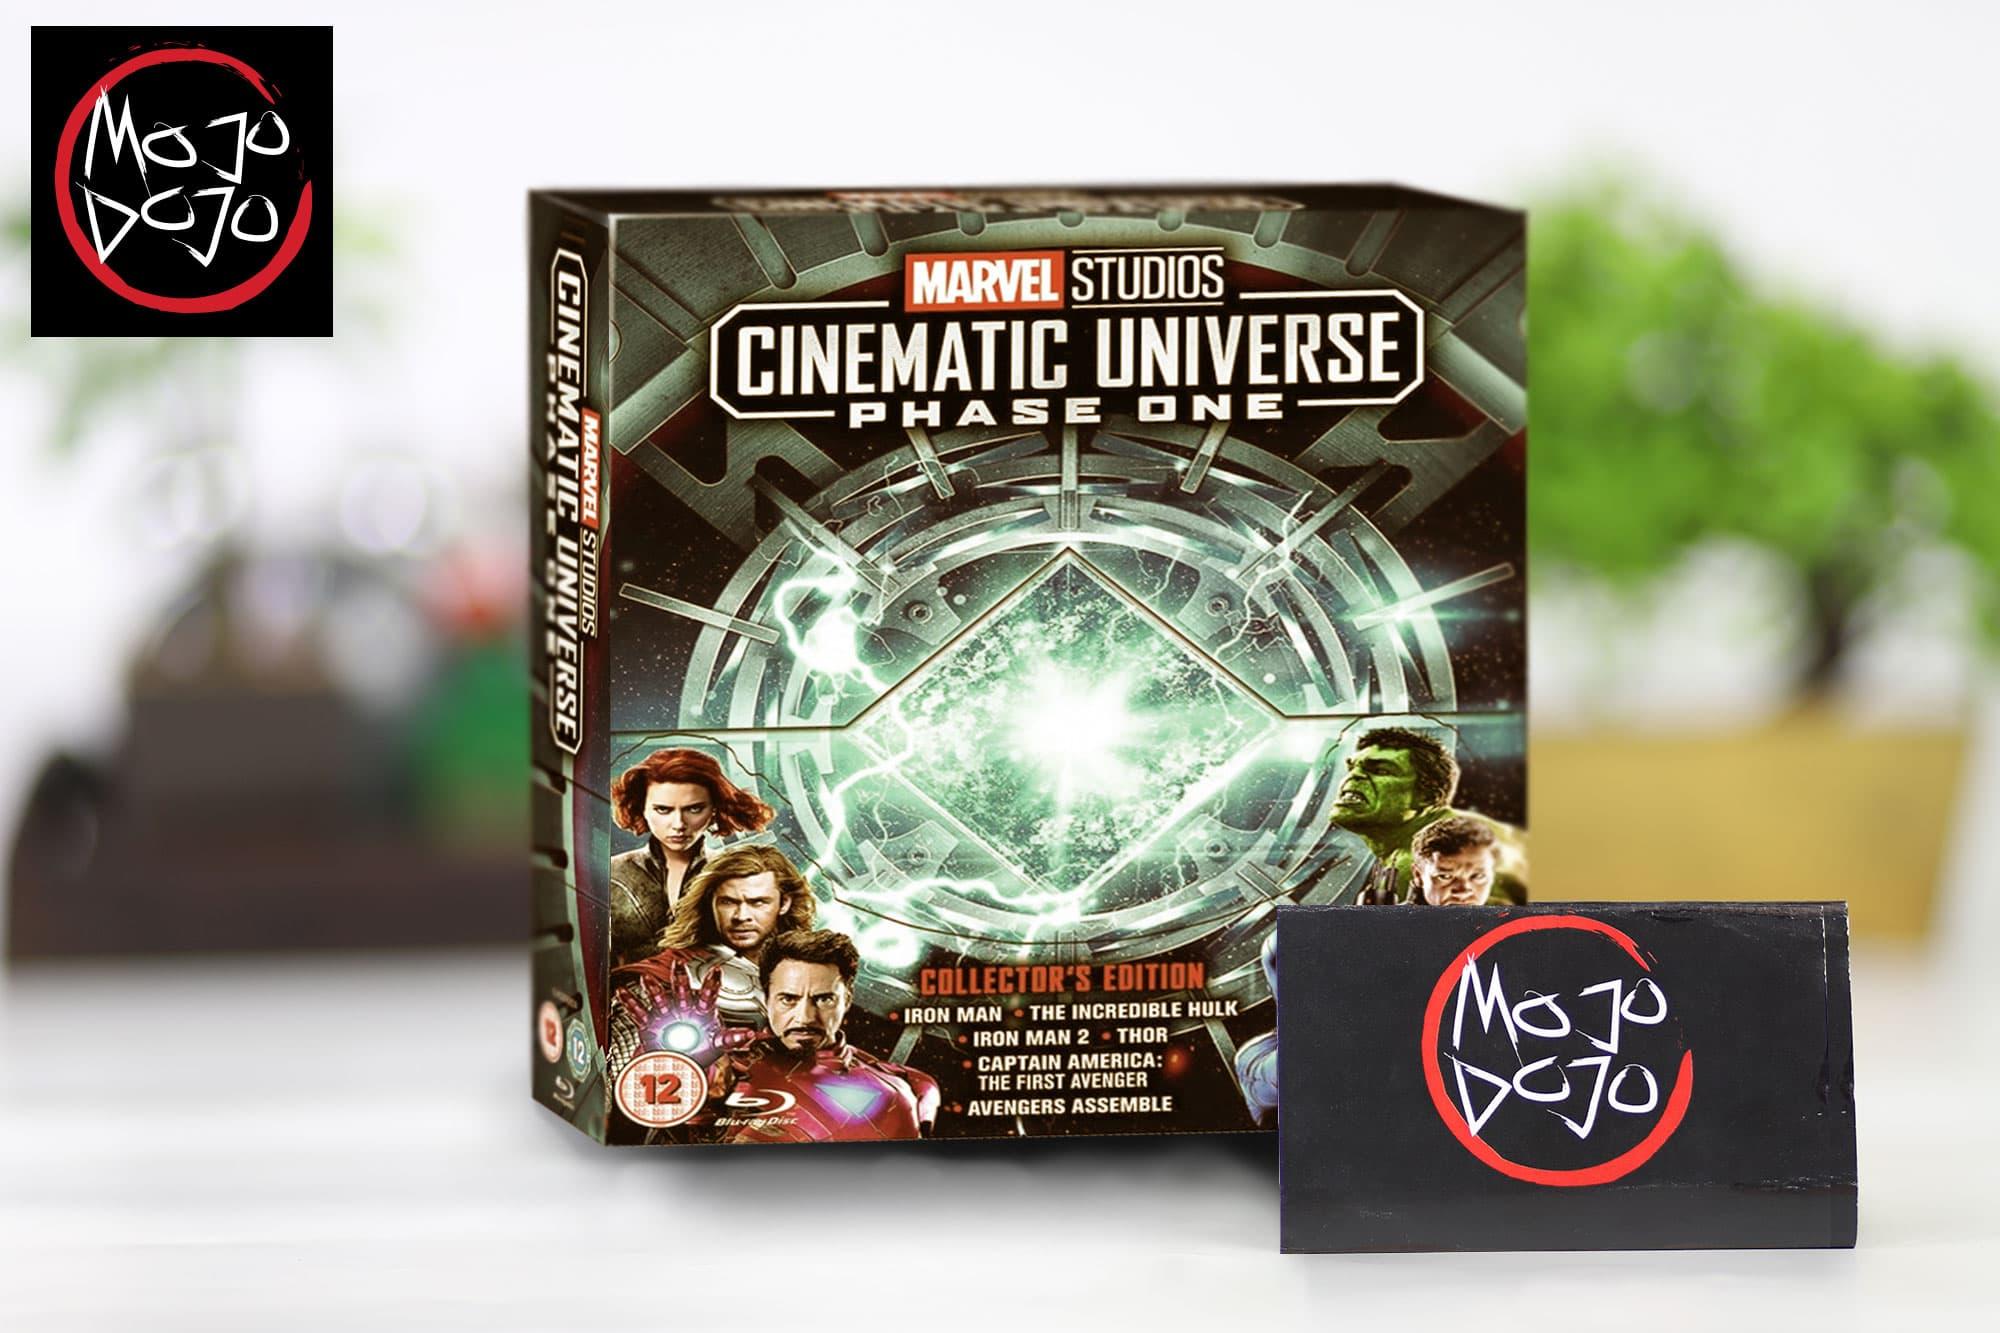 Jual Marvel Cinematic Universe Blue Ray Box Set Phase 3